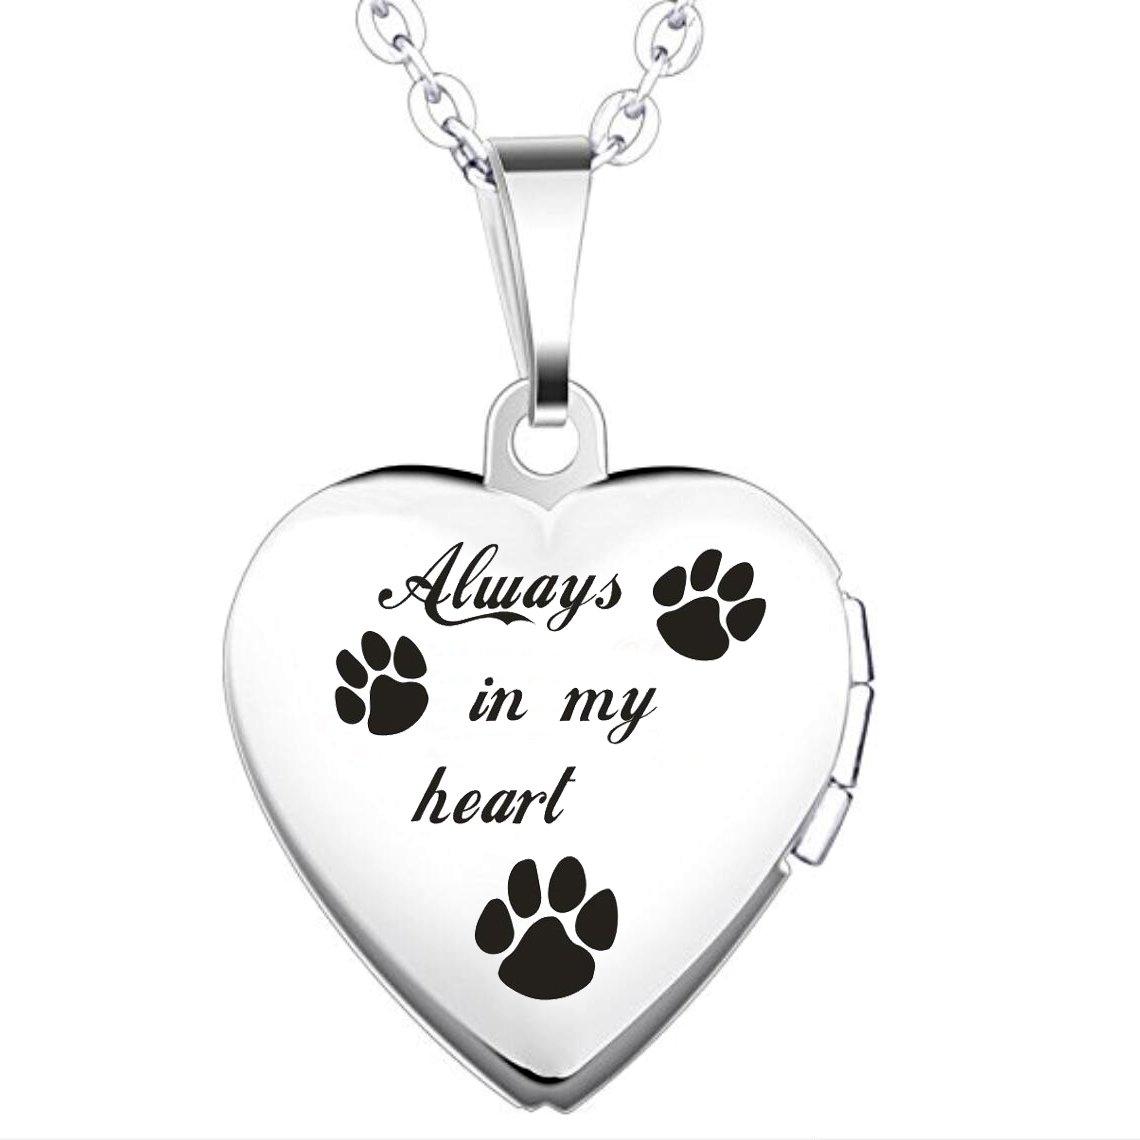 IXIQI Locket Always In My Heart Titanium Heart Infinity Love Locket Necklace UK_B07BNLRKP2